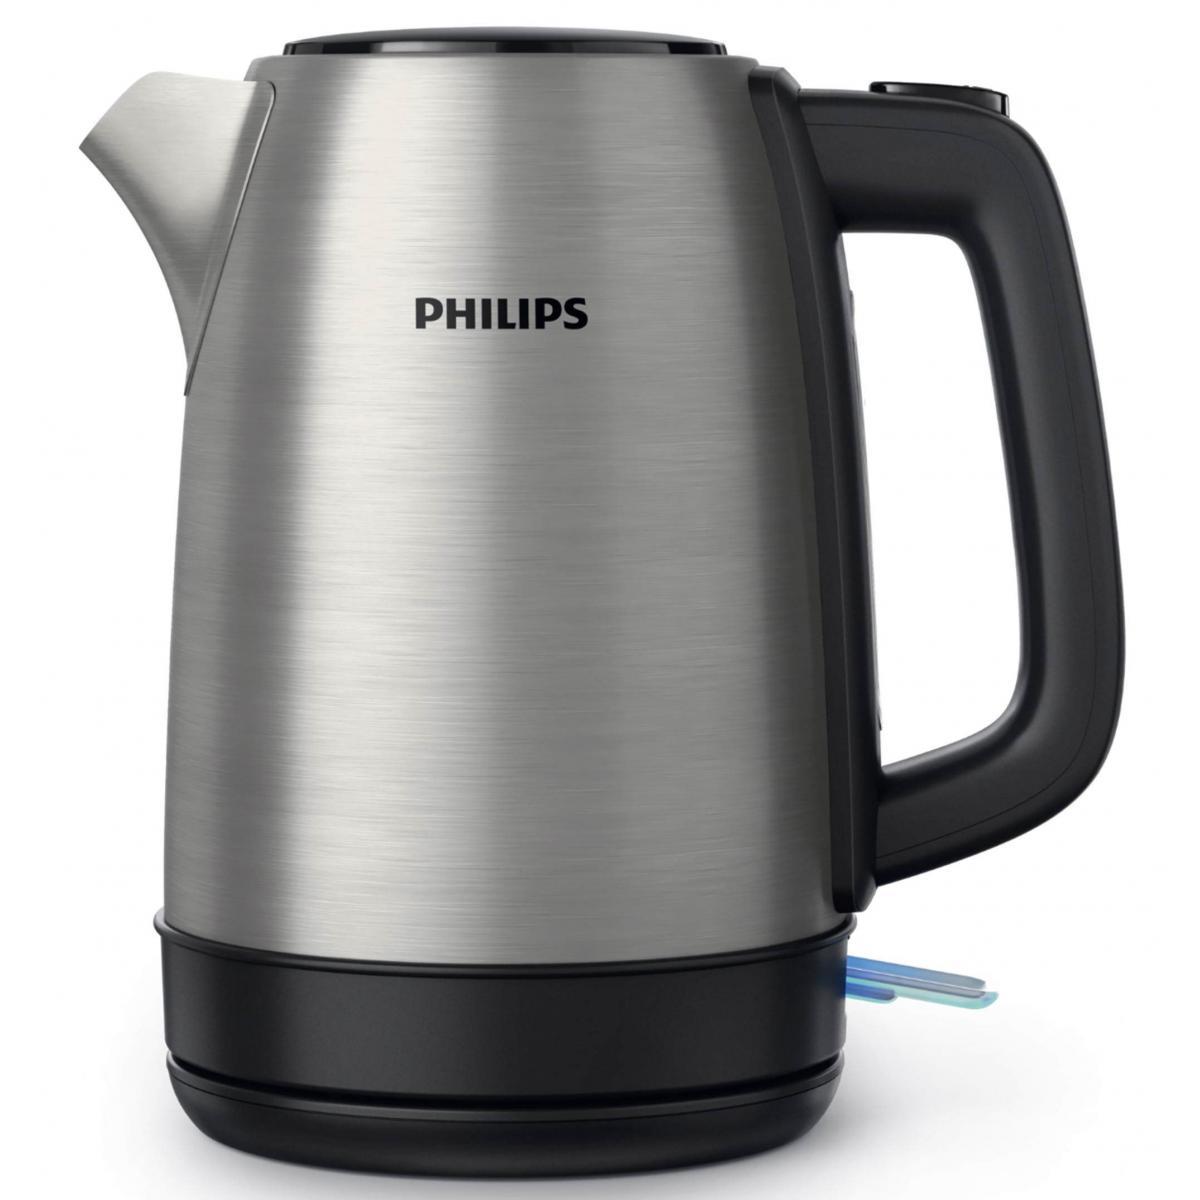 Philips BOUILLOIRE PHILIPS HD 9350/90